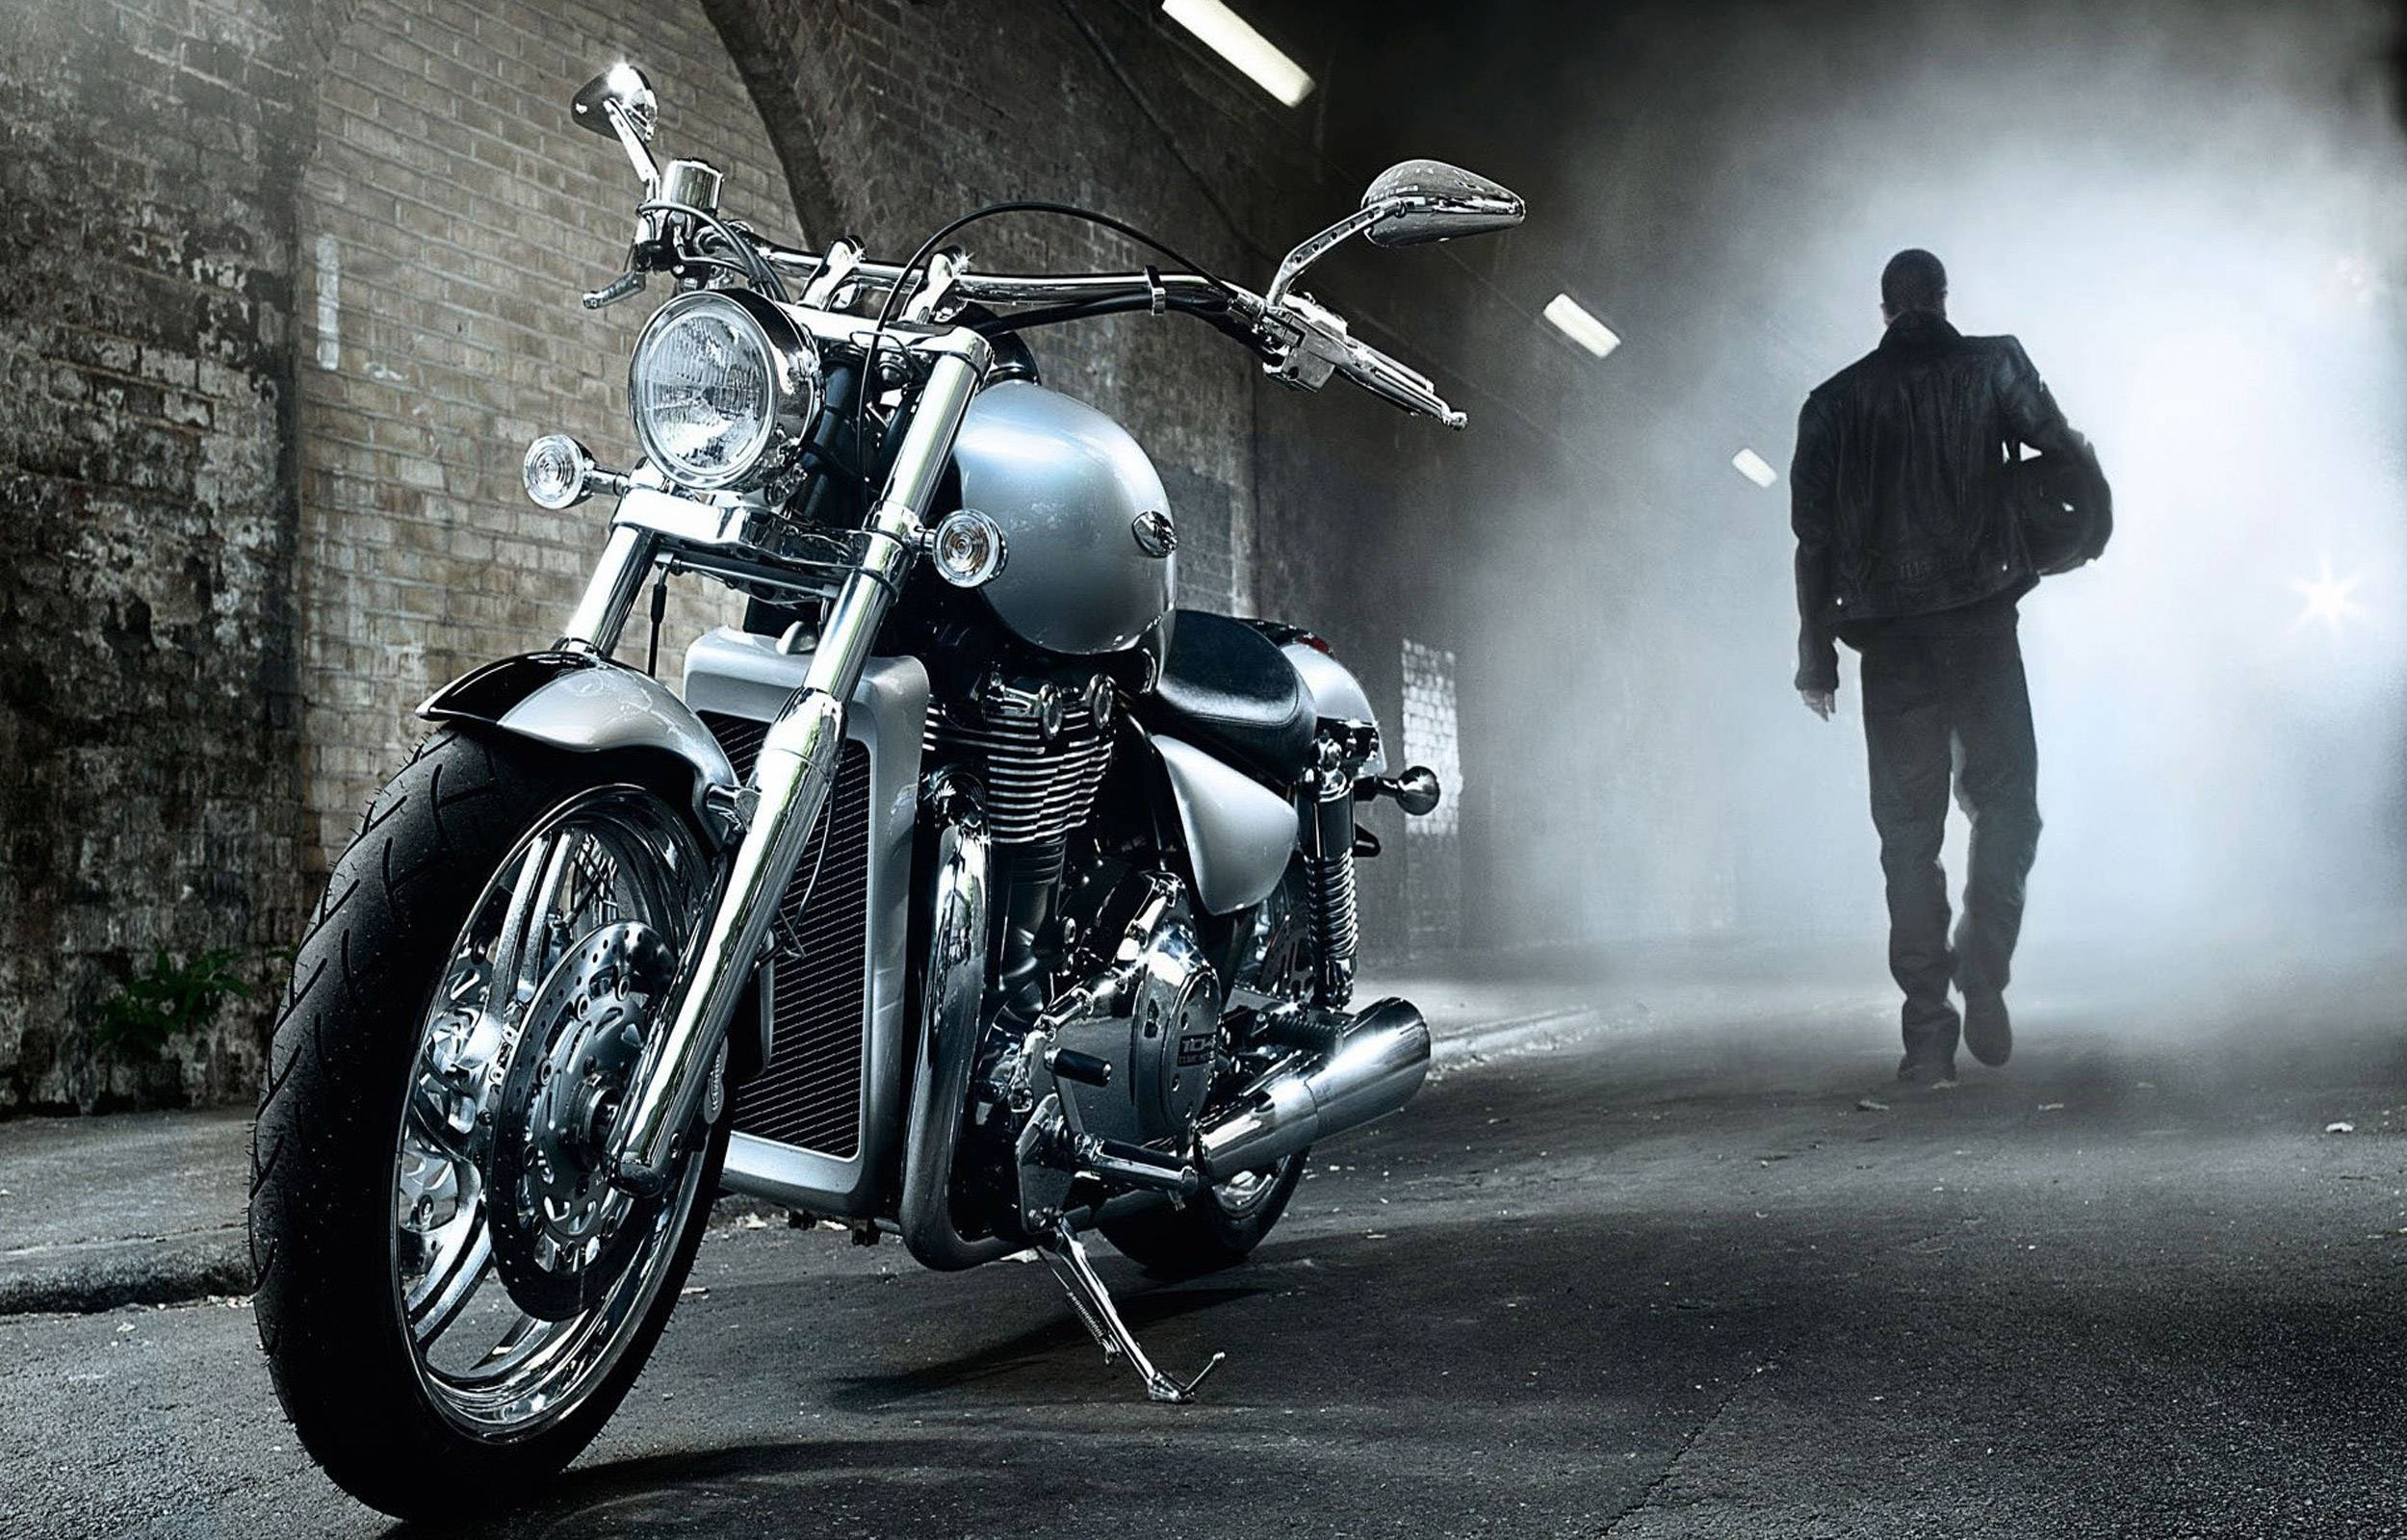 Harley Davidson Wallpapers 2500x1600